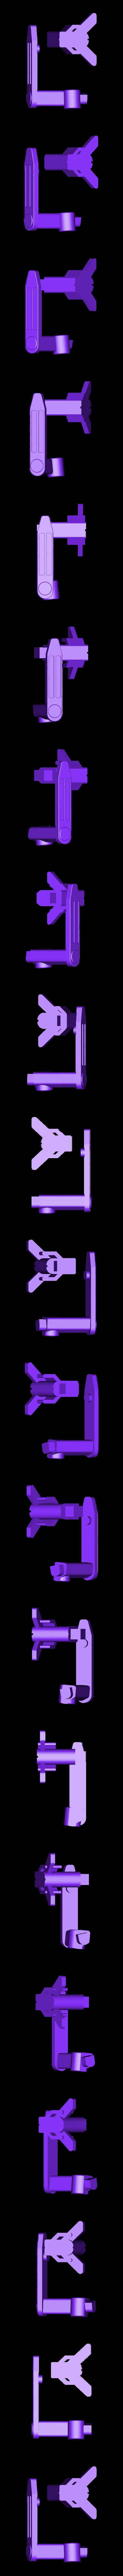 futureBear-continuousTracksRb.stl Download free STL file Future Bear - M5A1 Ultra Evolution • 3D printing design, cycstudio